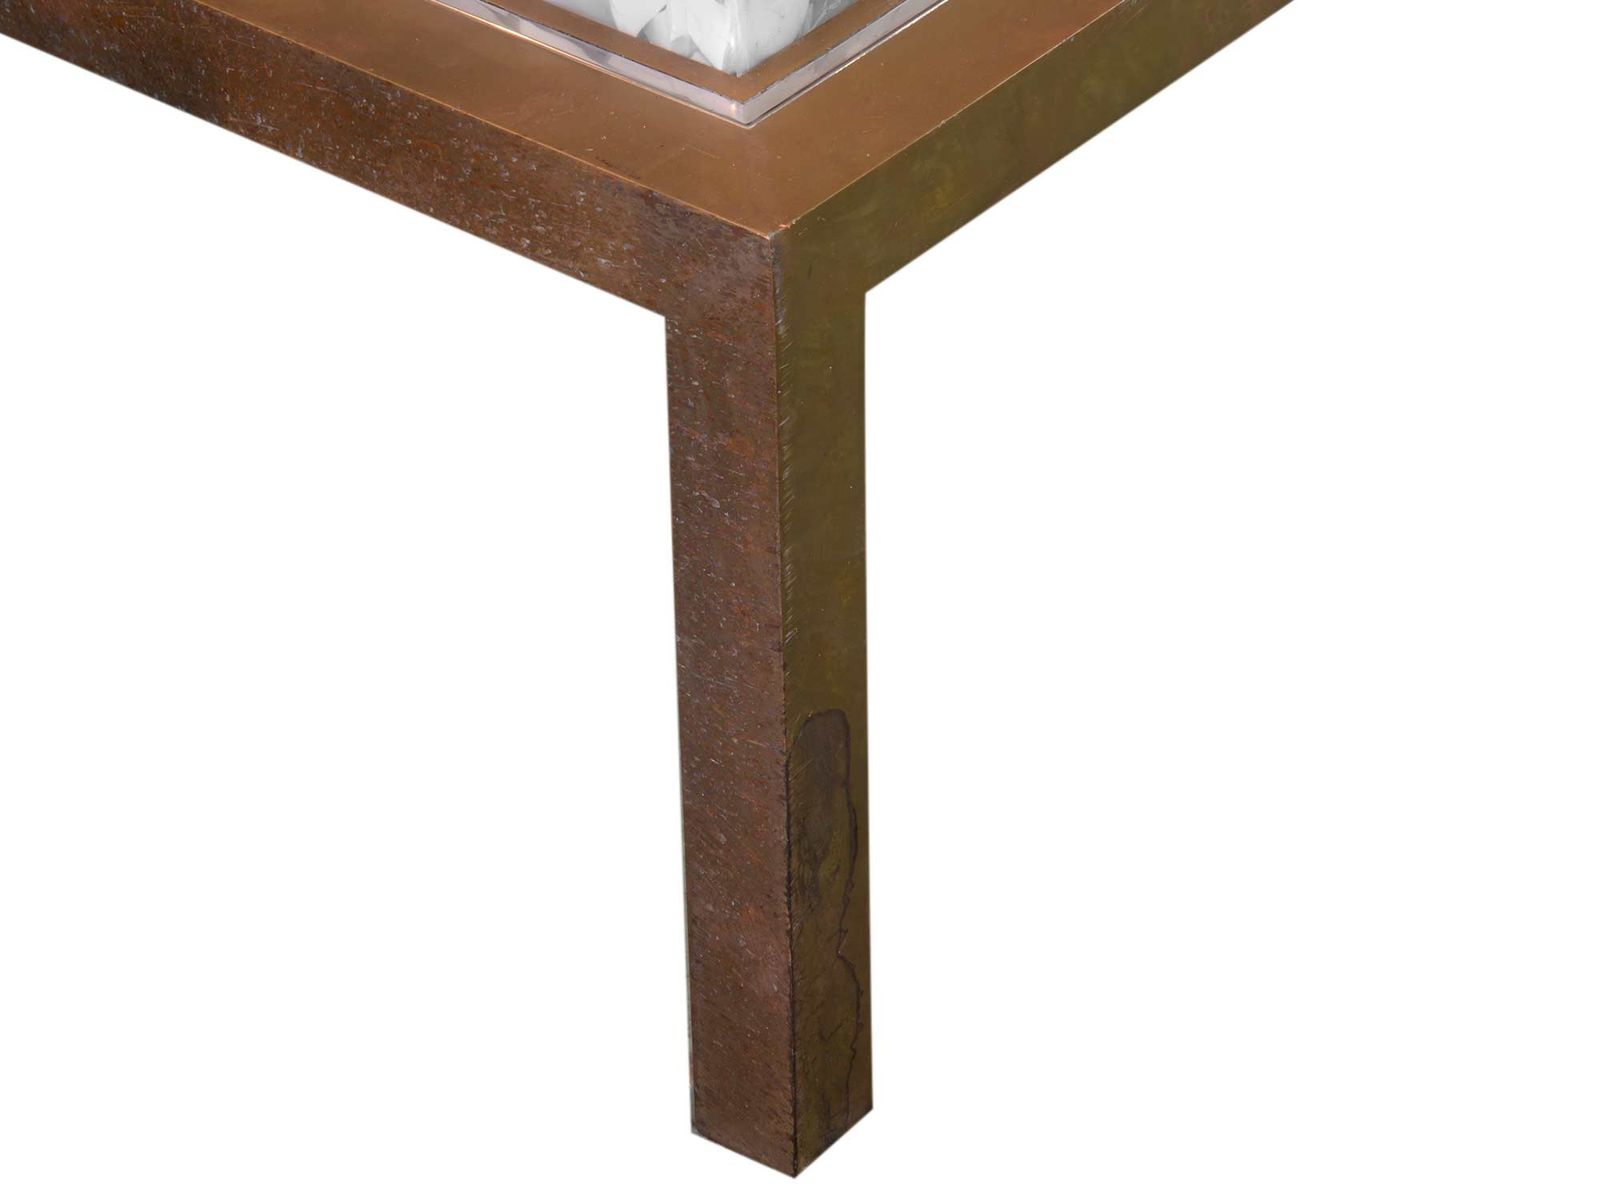 Table basse en r sine par jean brand 1970s en vente sur - Table basse en resine ...